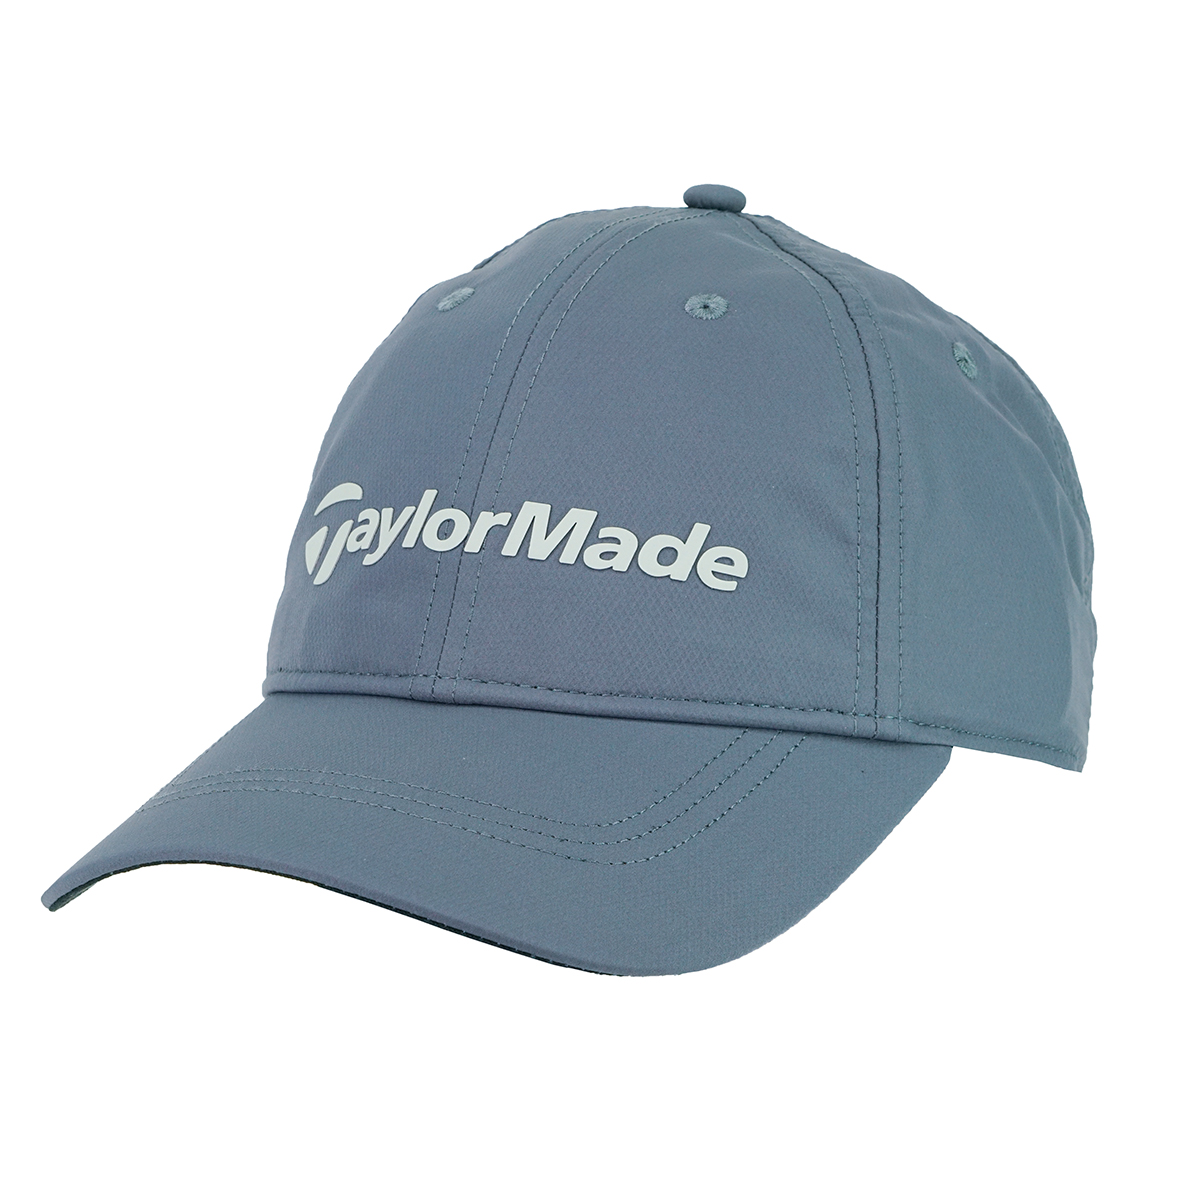 c81d0d9f751 TaylorMade Men s 2018 Performance Lite Hat Grey 888167658599